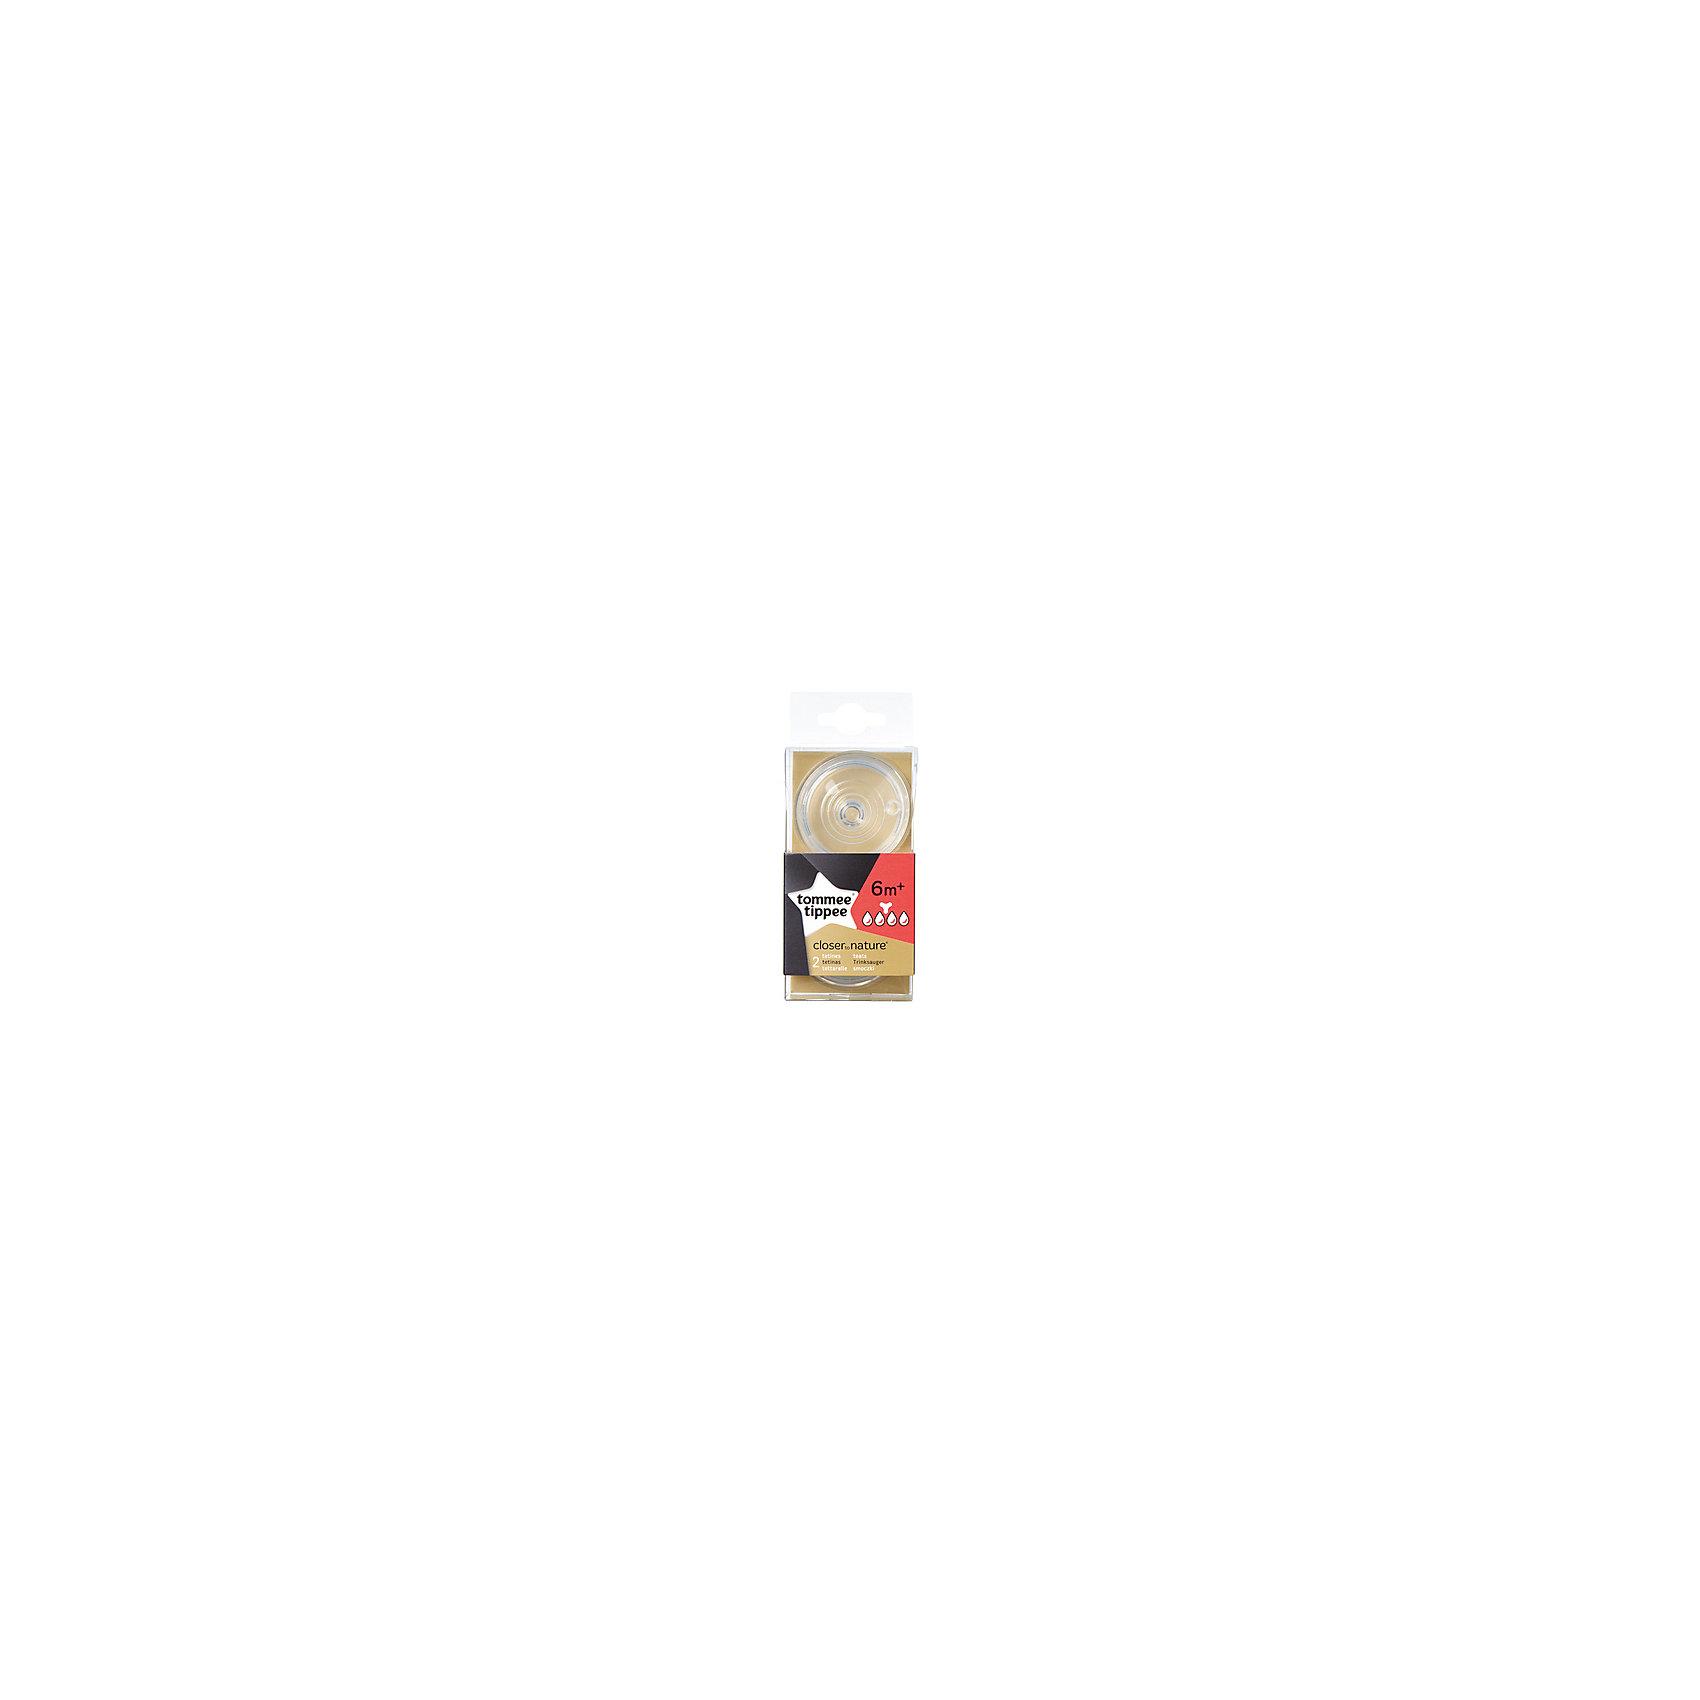 Cоски для бутылочки Tommee Tippee Close to nature Easi-vent для густой пищи, с 6 мес., 2 шт.